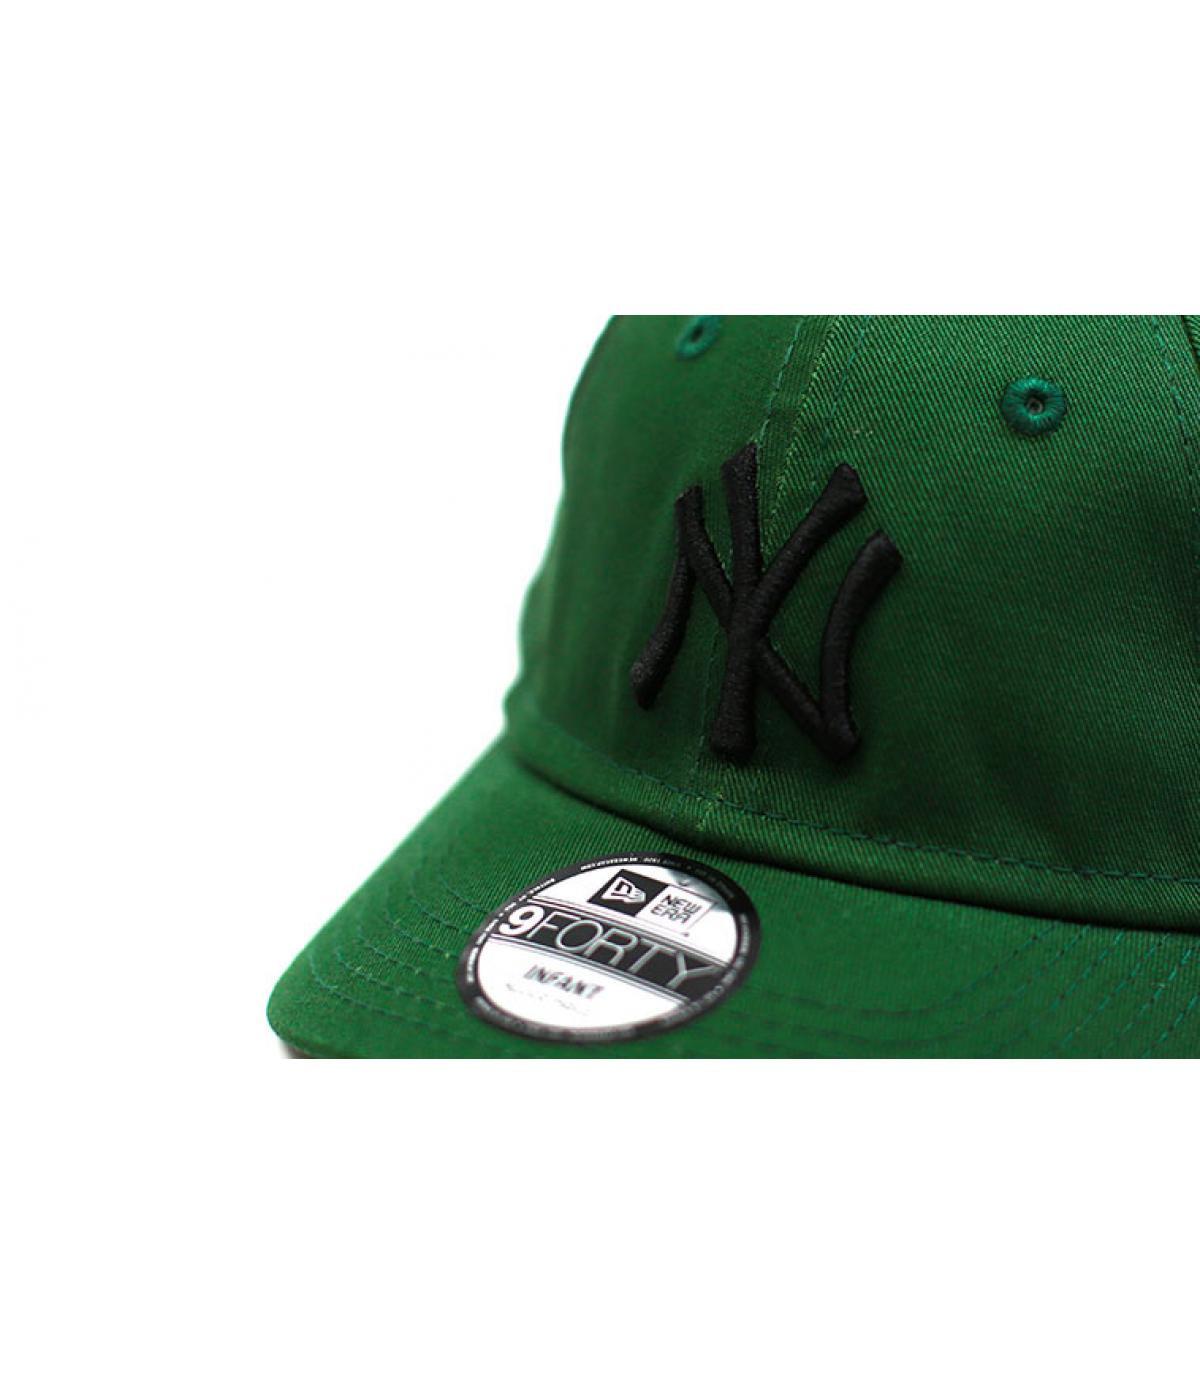 Details Baby Cap League Ess NY green black - Abbildung 3